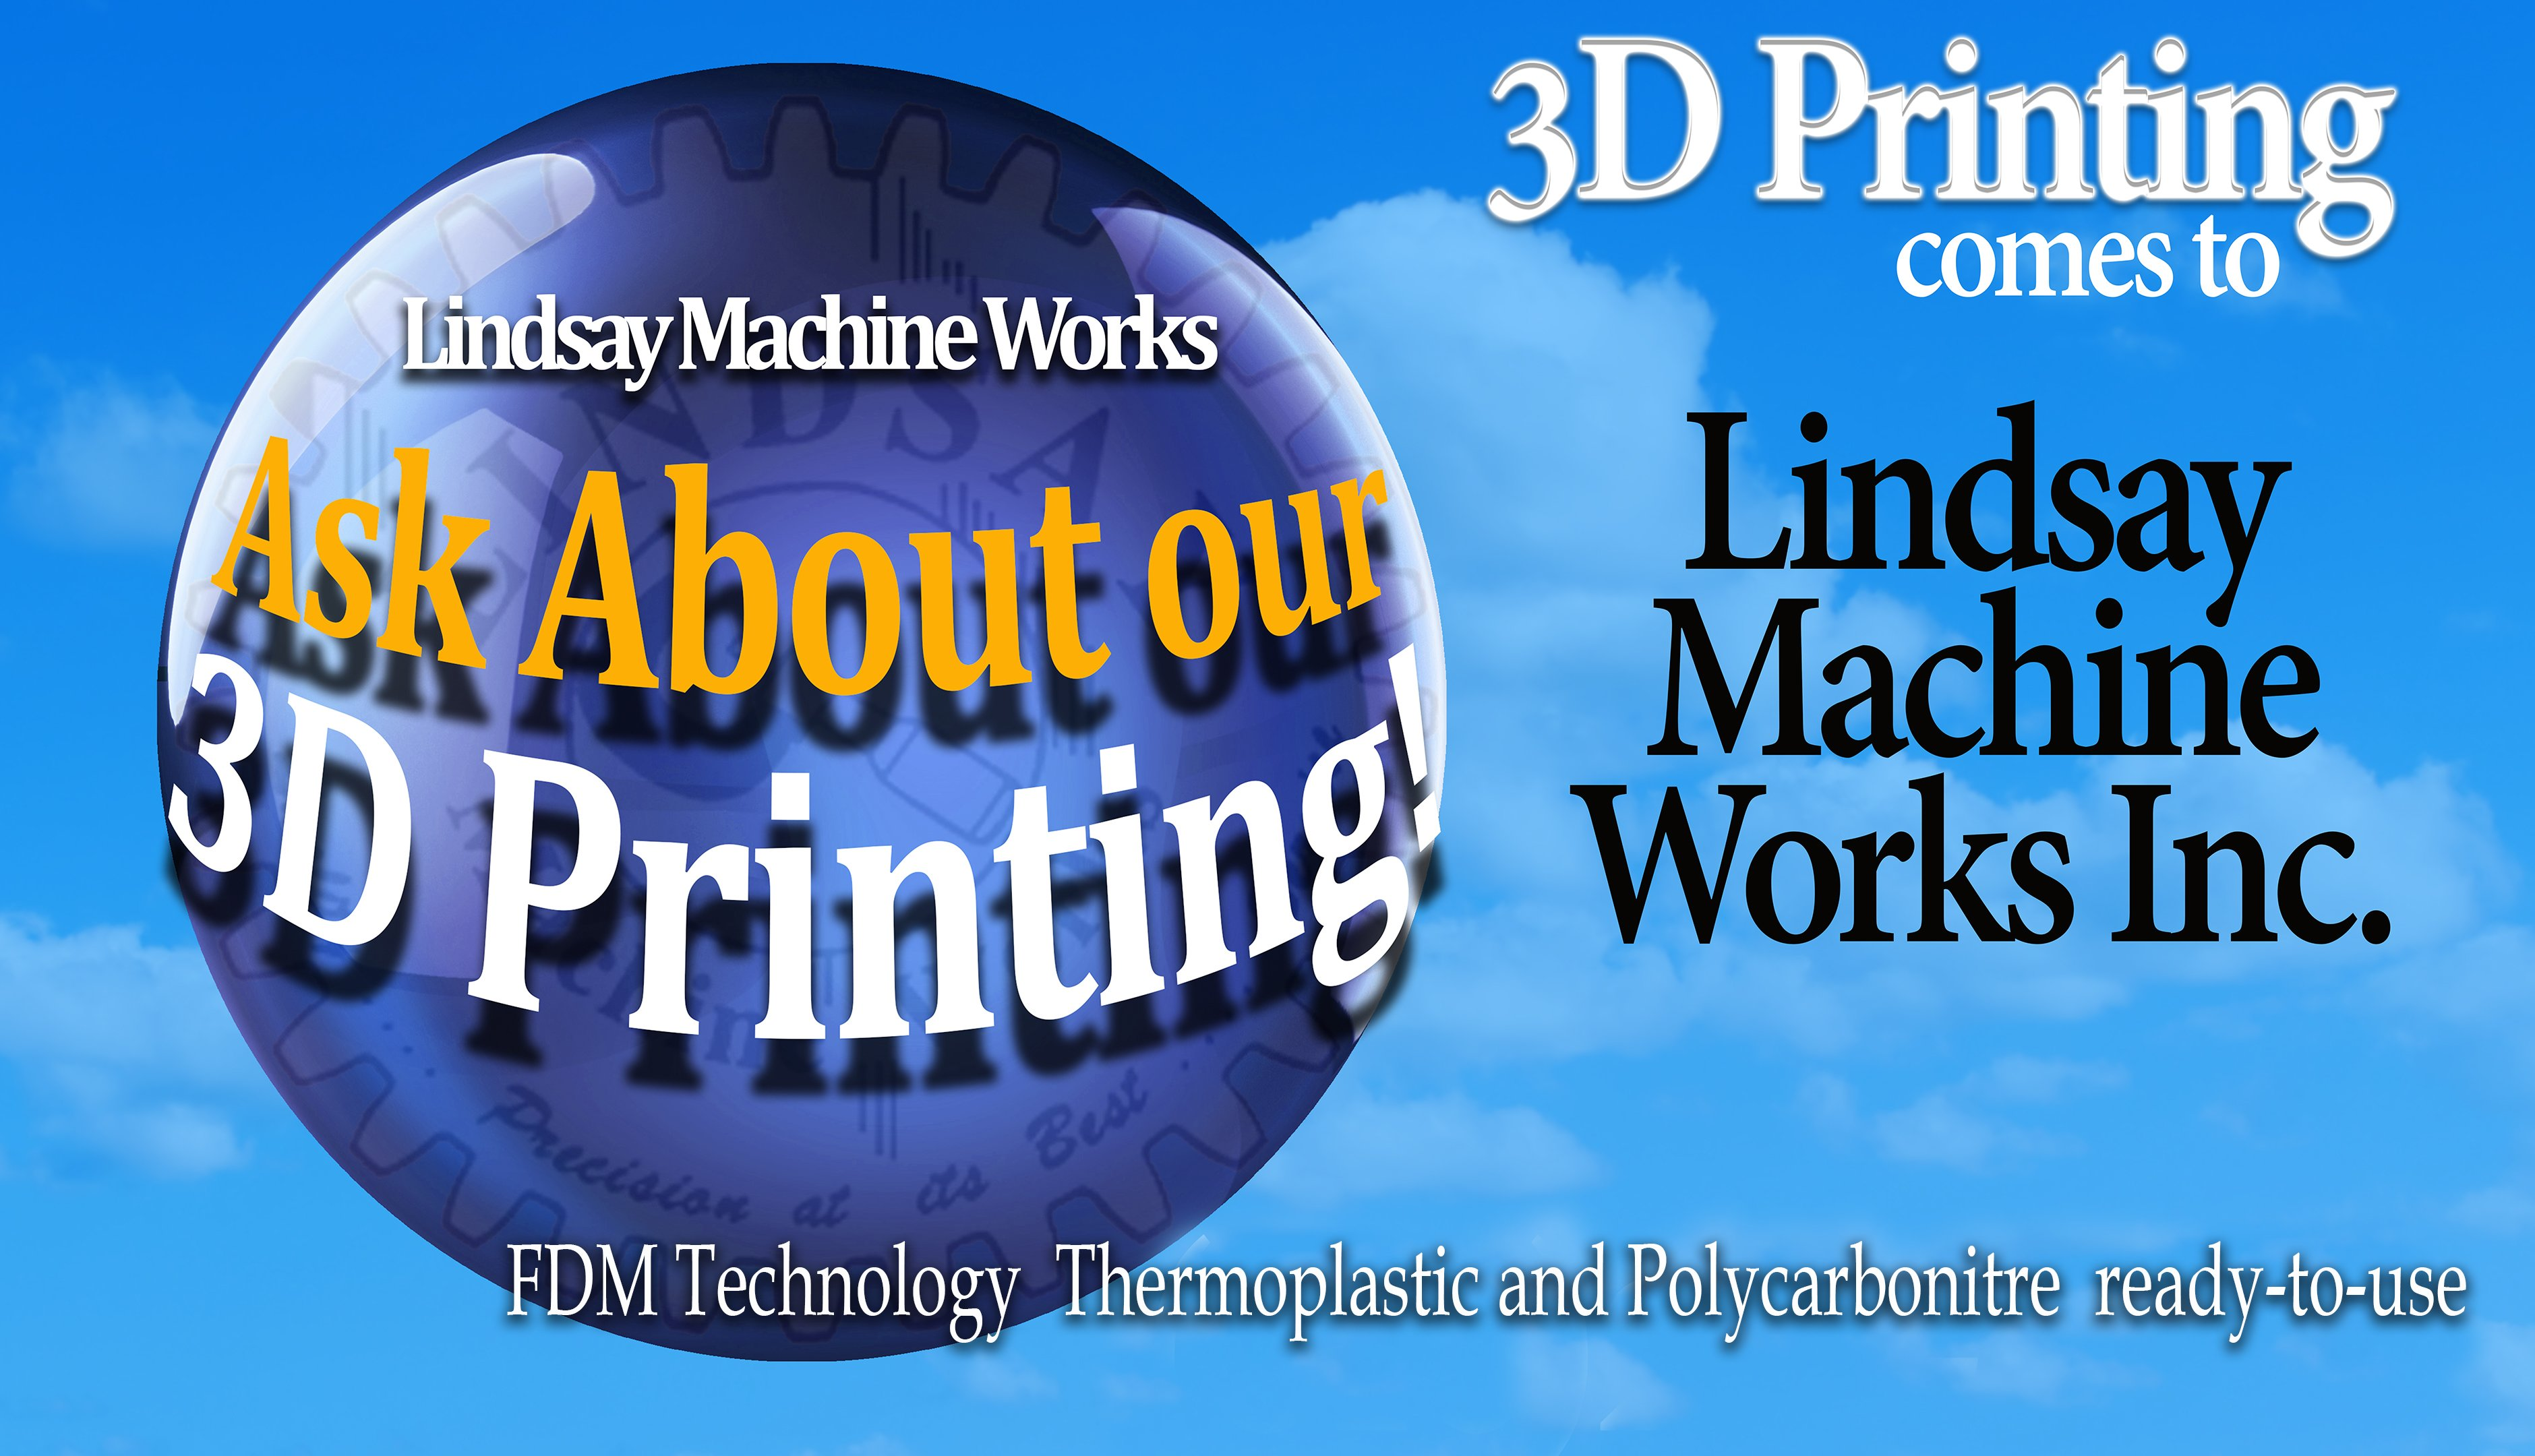 3D Printing in Kansas City